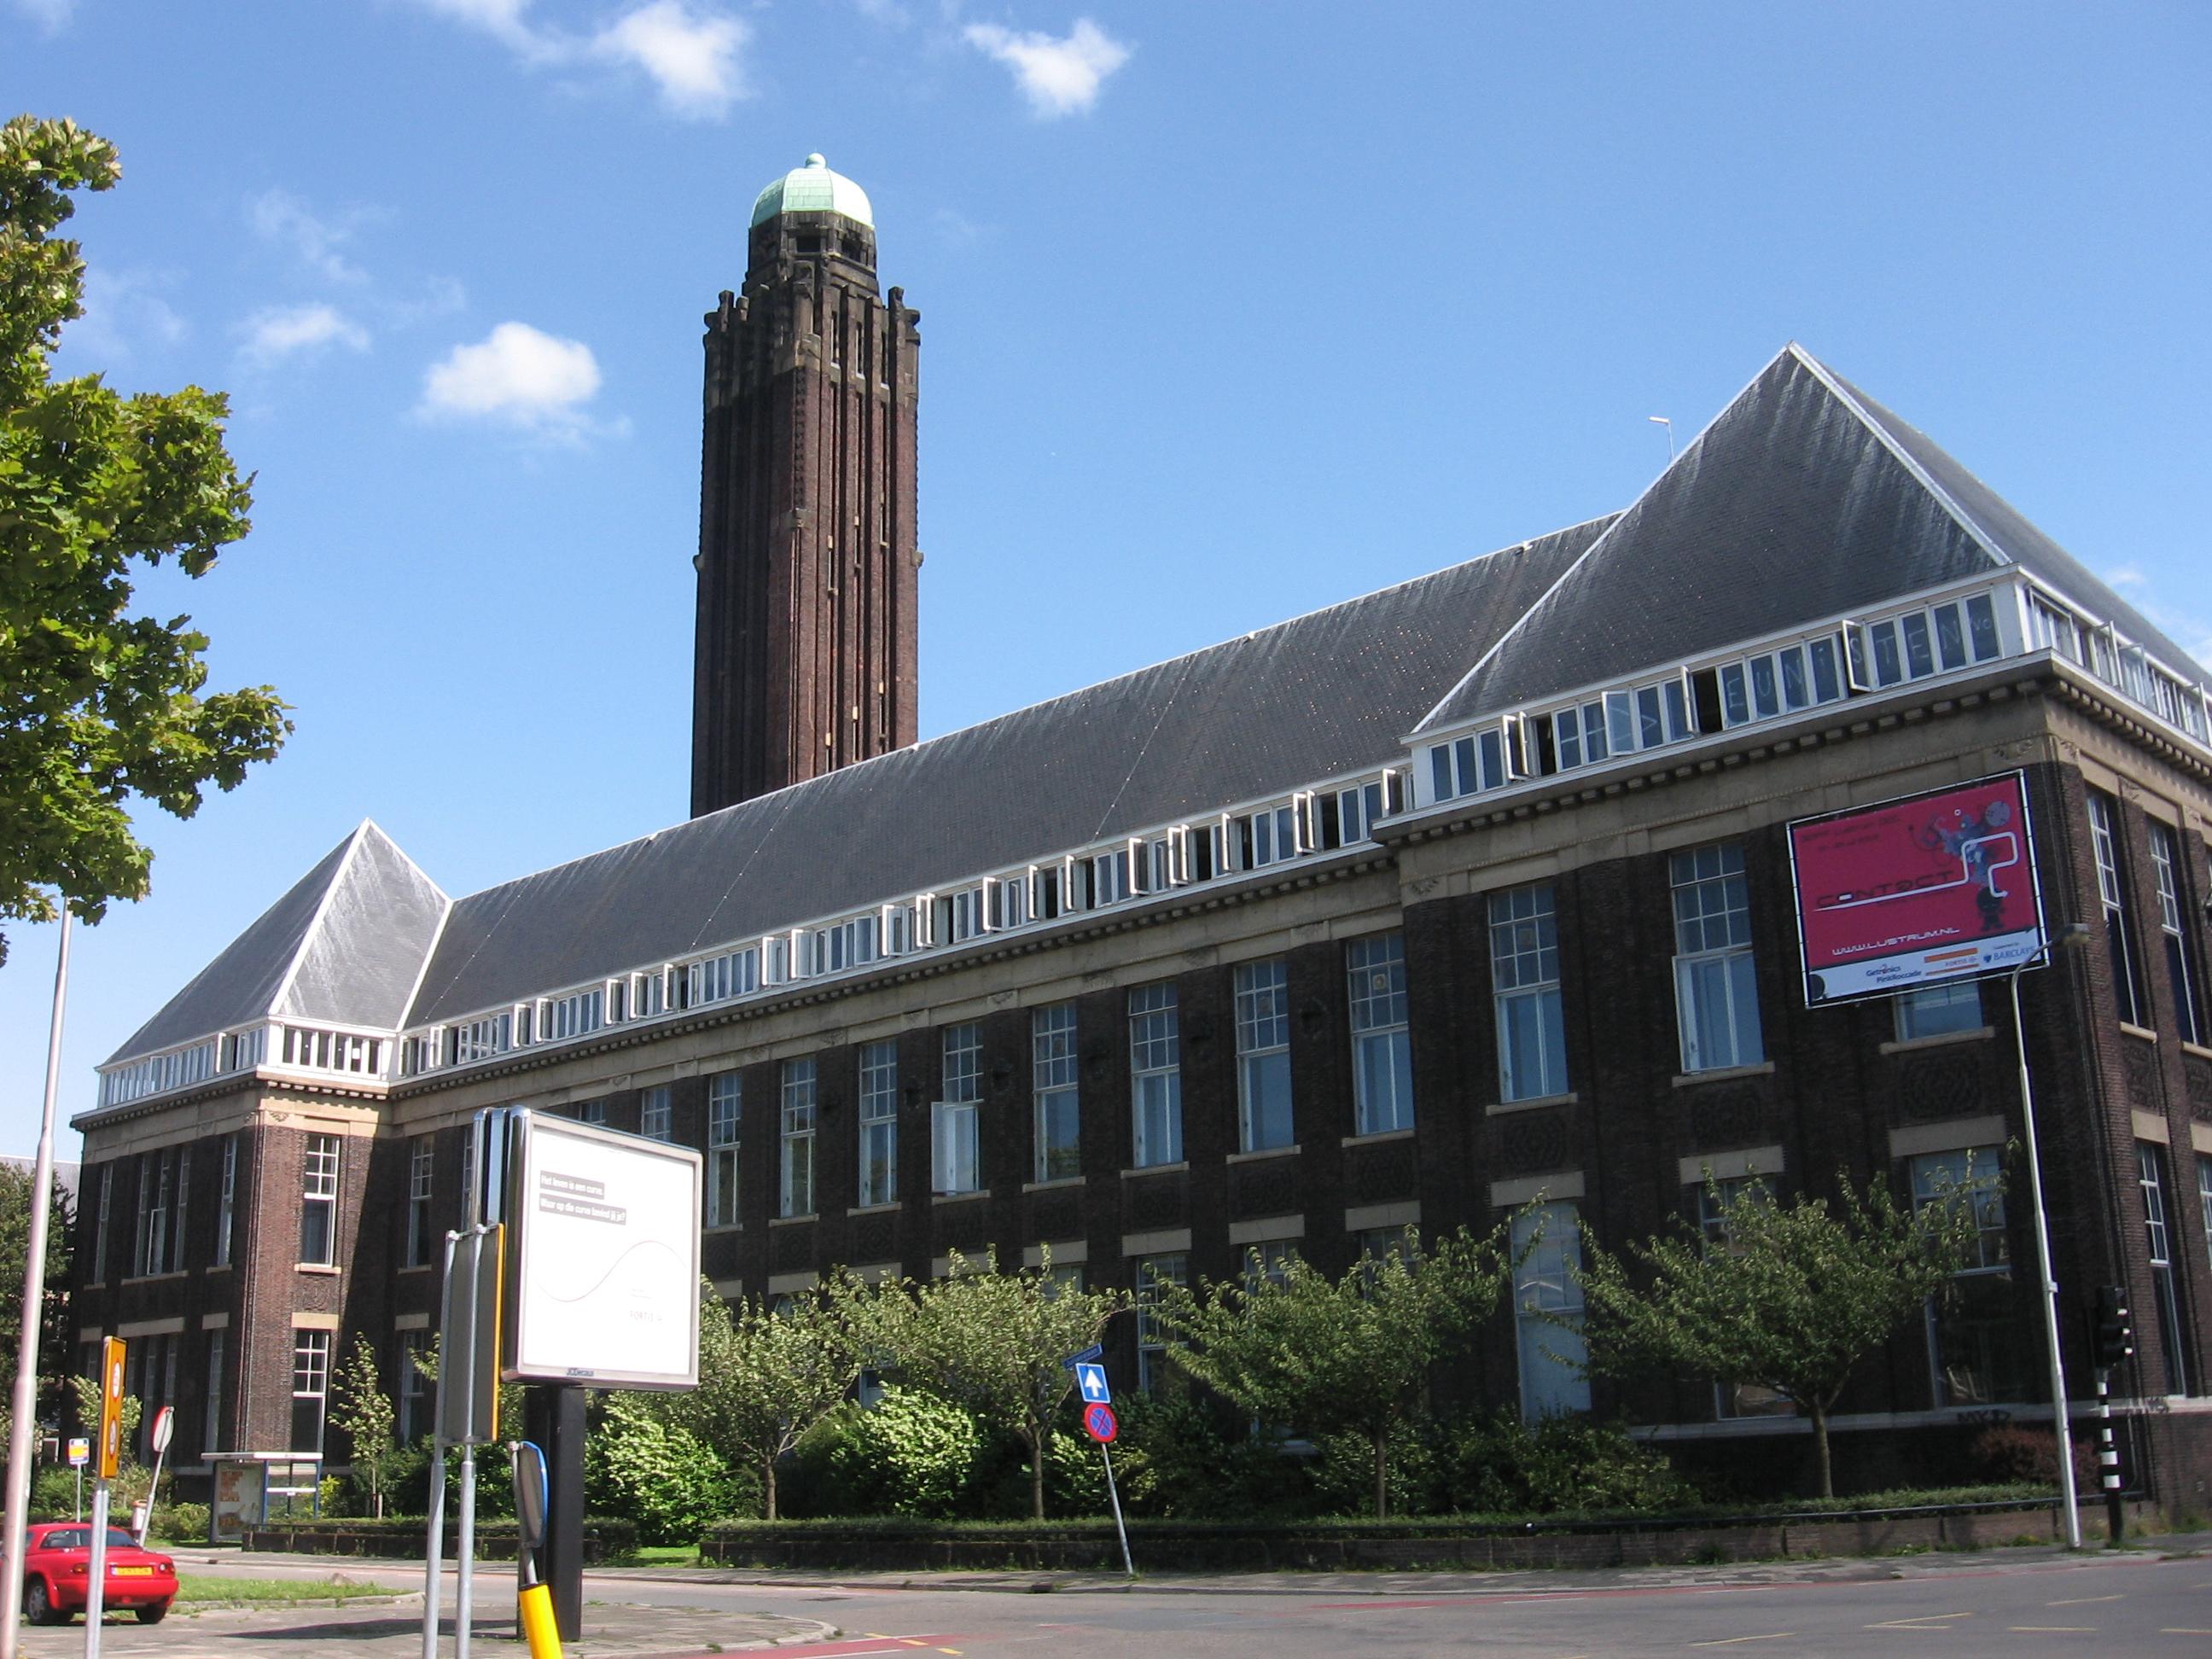 Delft University of Technology - Sekolah Arsitektur Terbaik Dunia